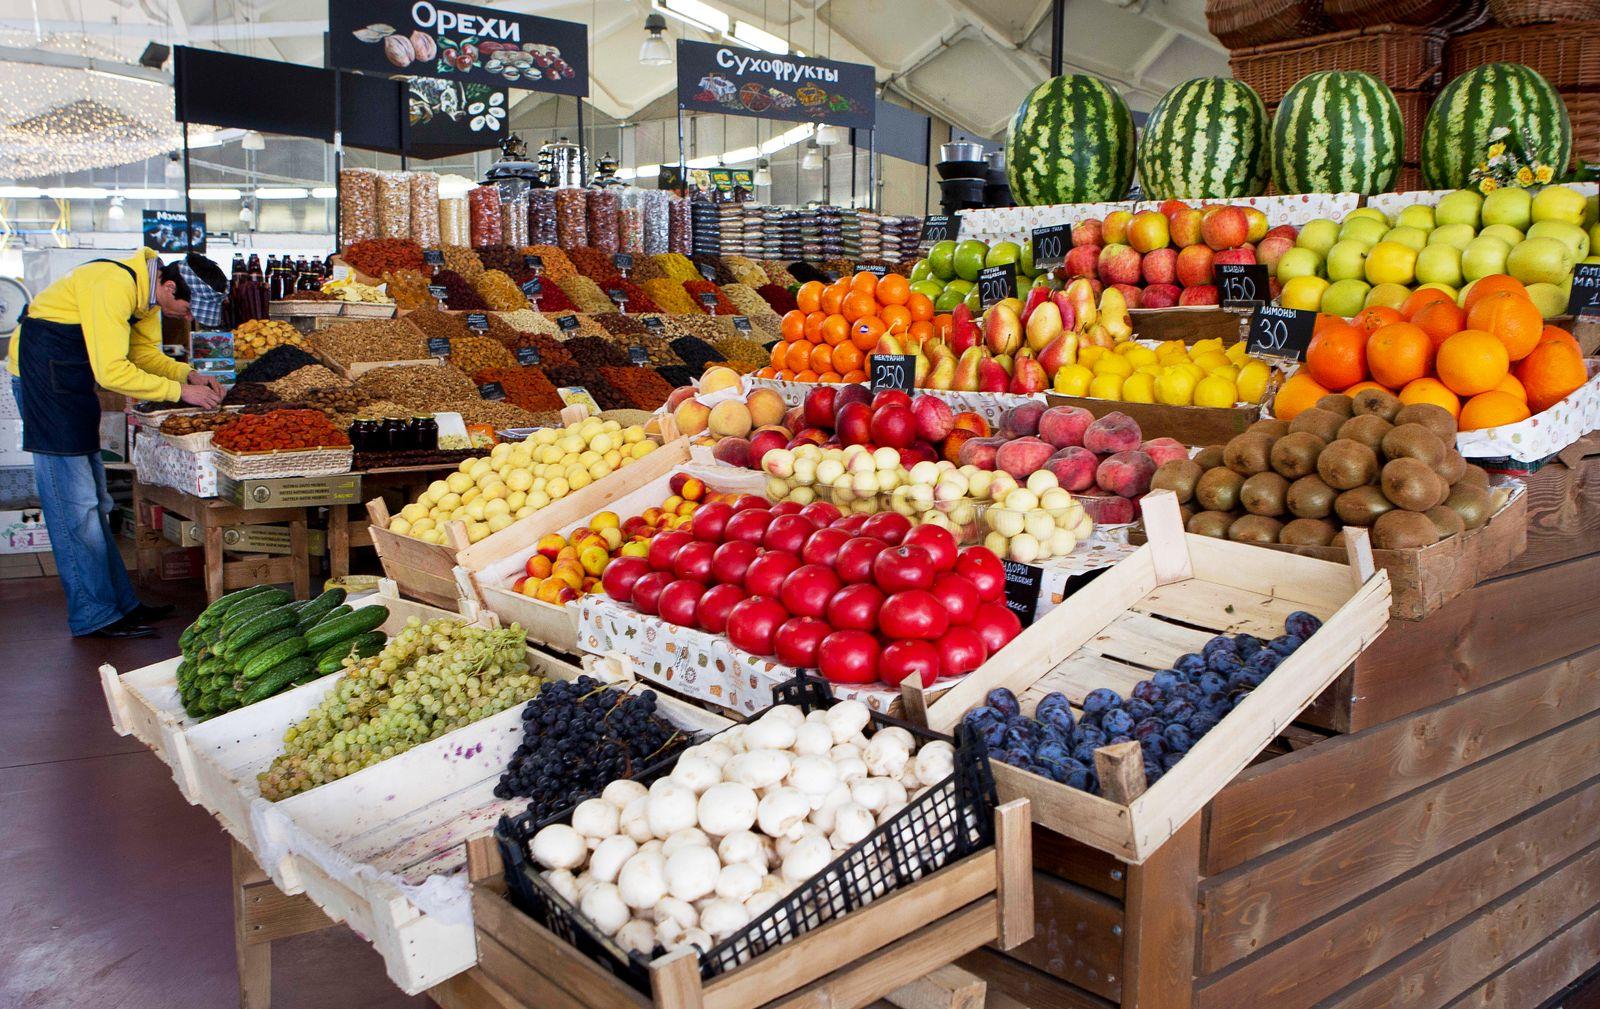 Russland / Obst / Gemüse / Import / Markt